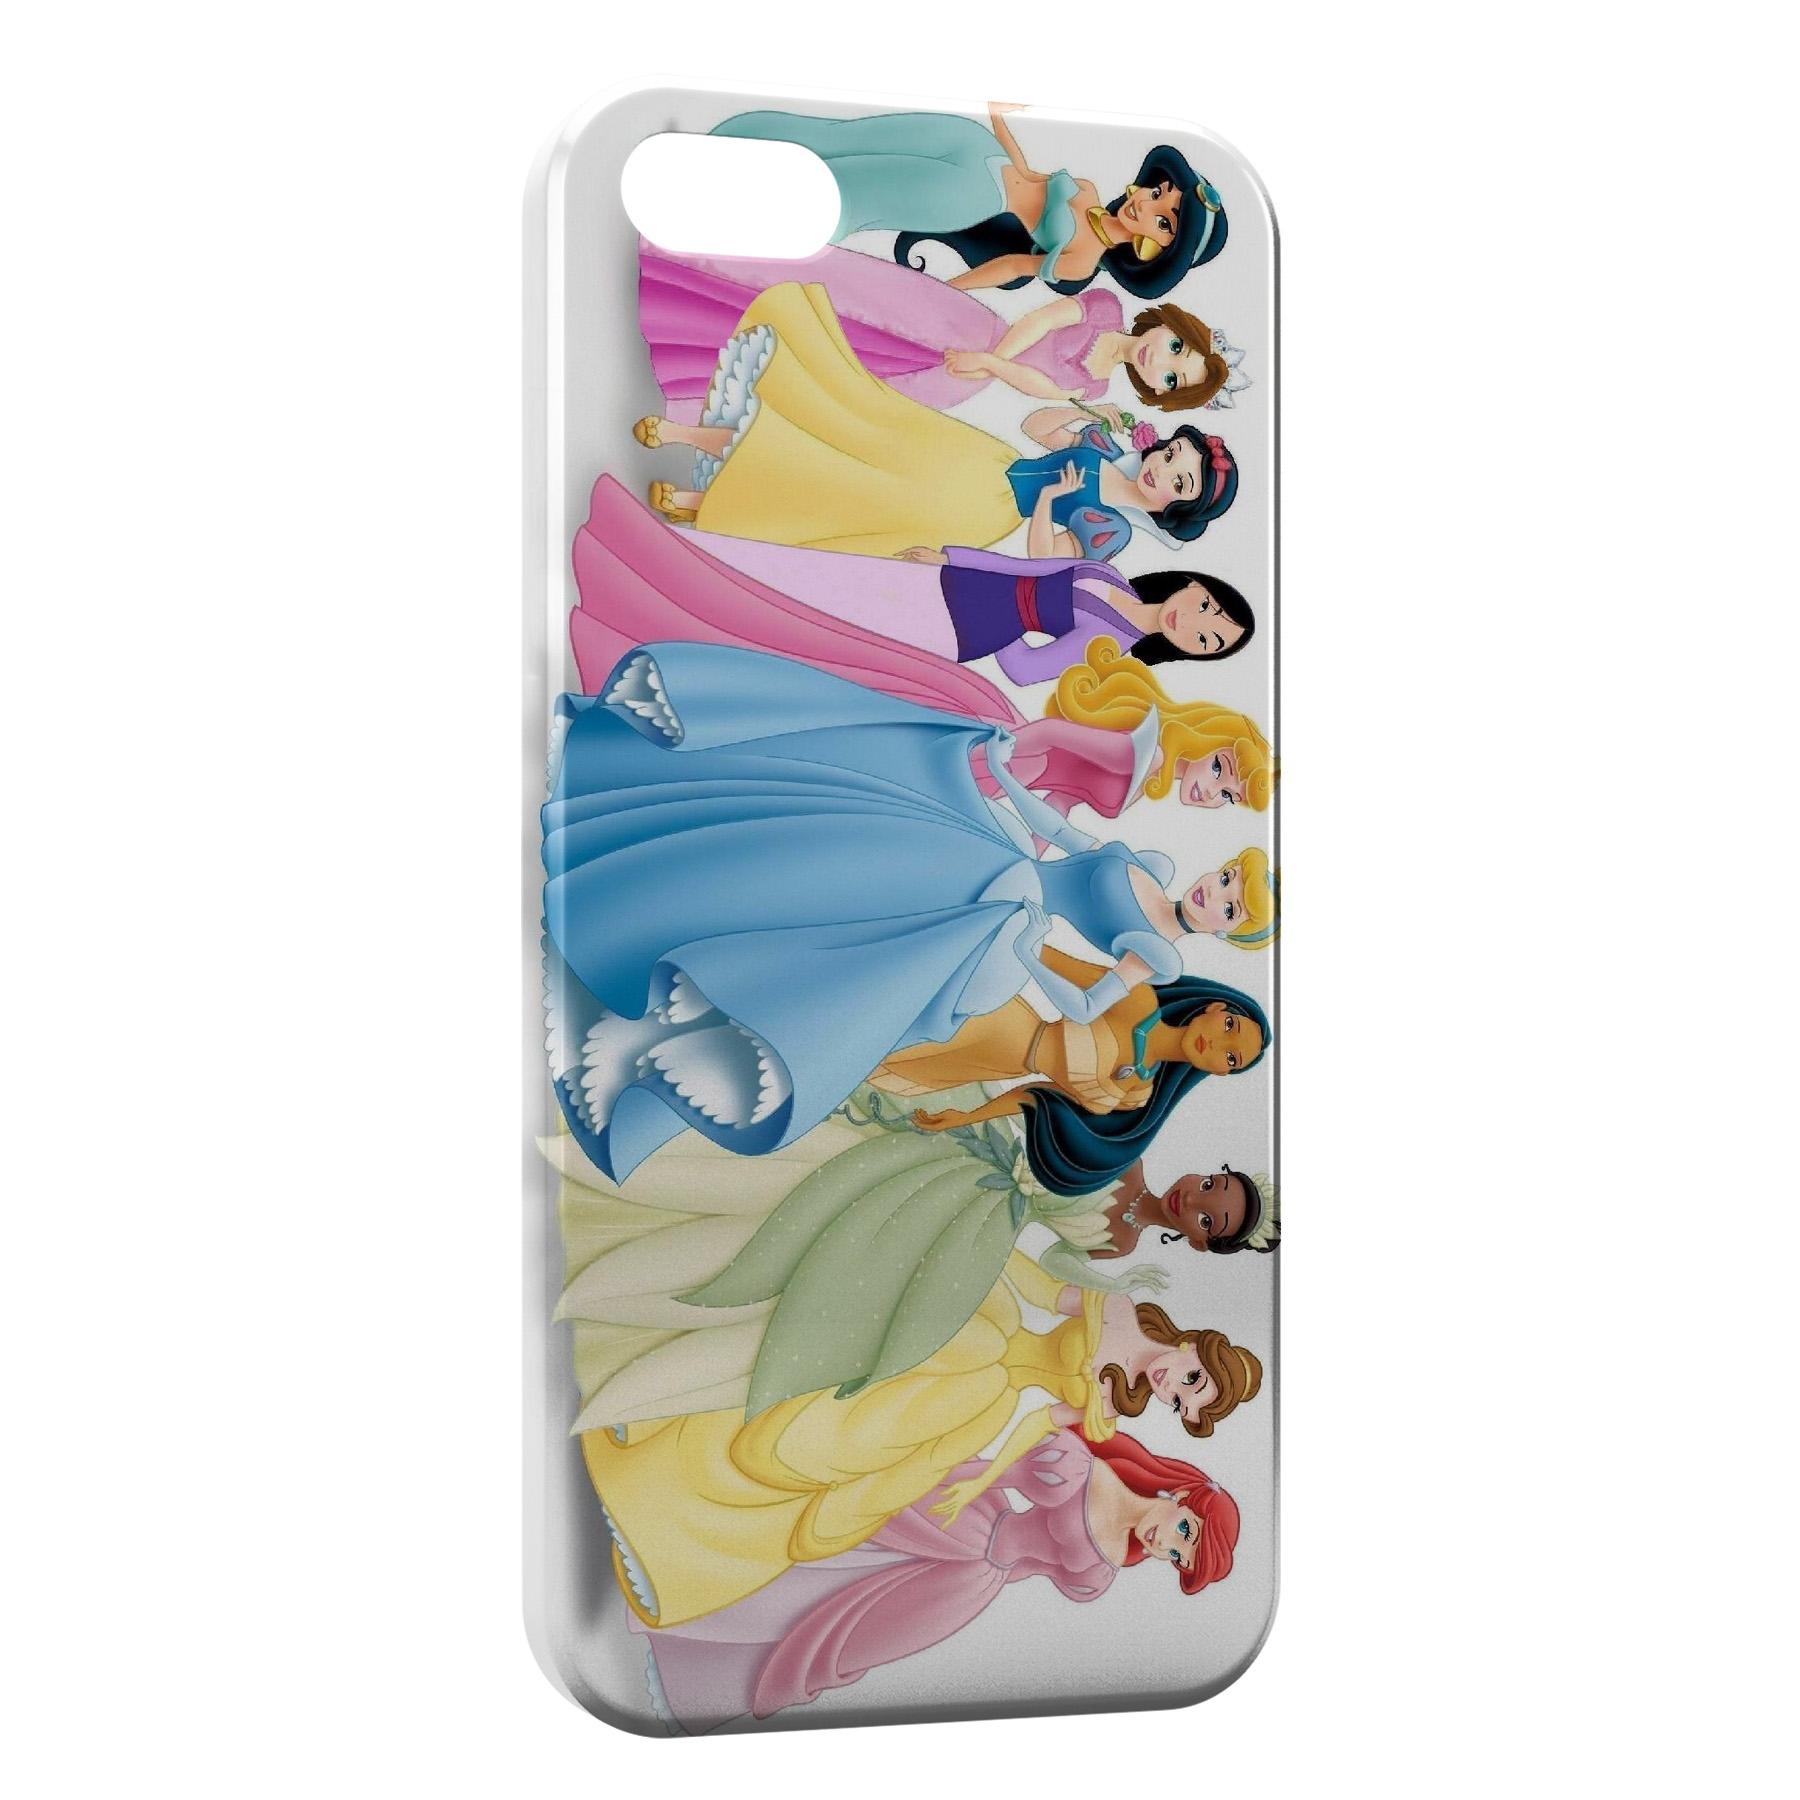 Coque iPhone 55SSE Disney Princess